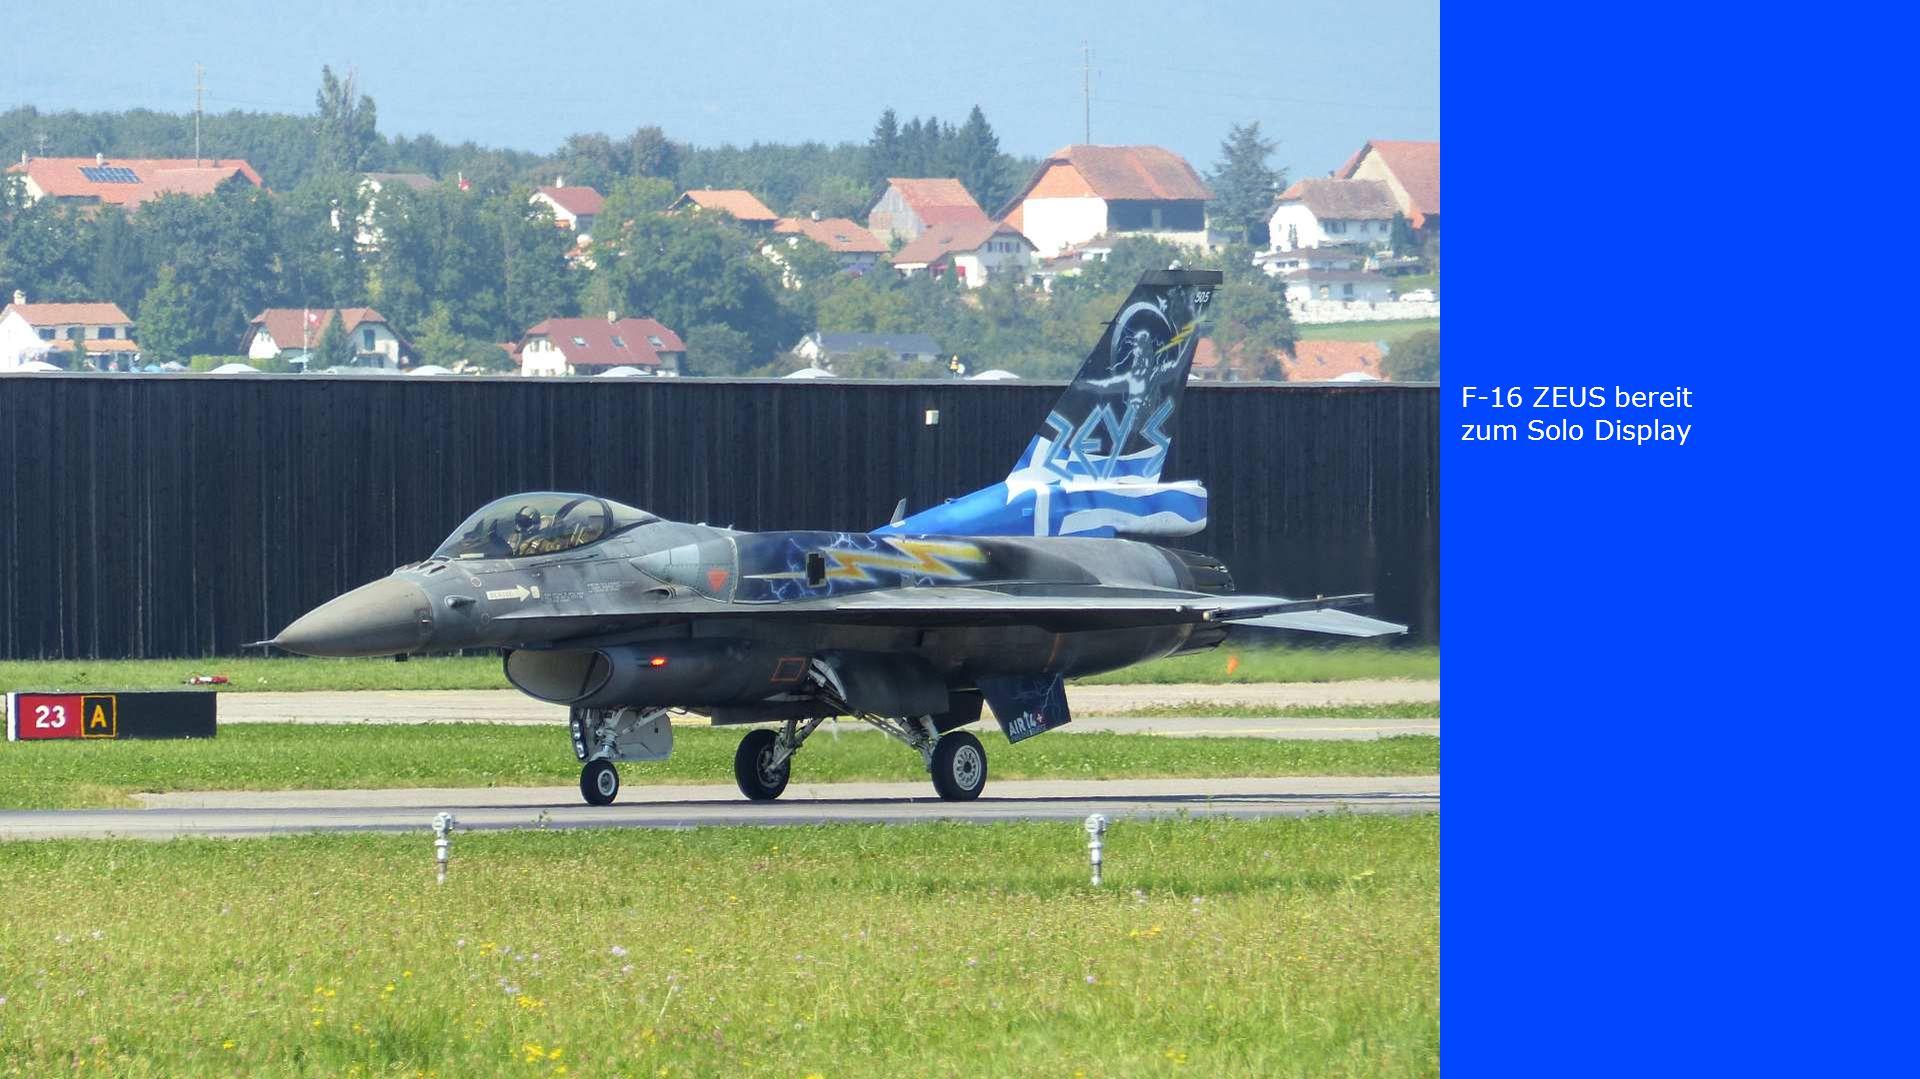 F-16 ZEUS bereit zum Solo Display